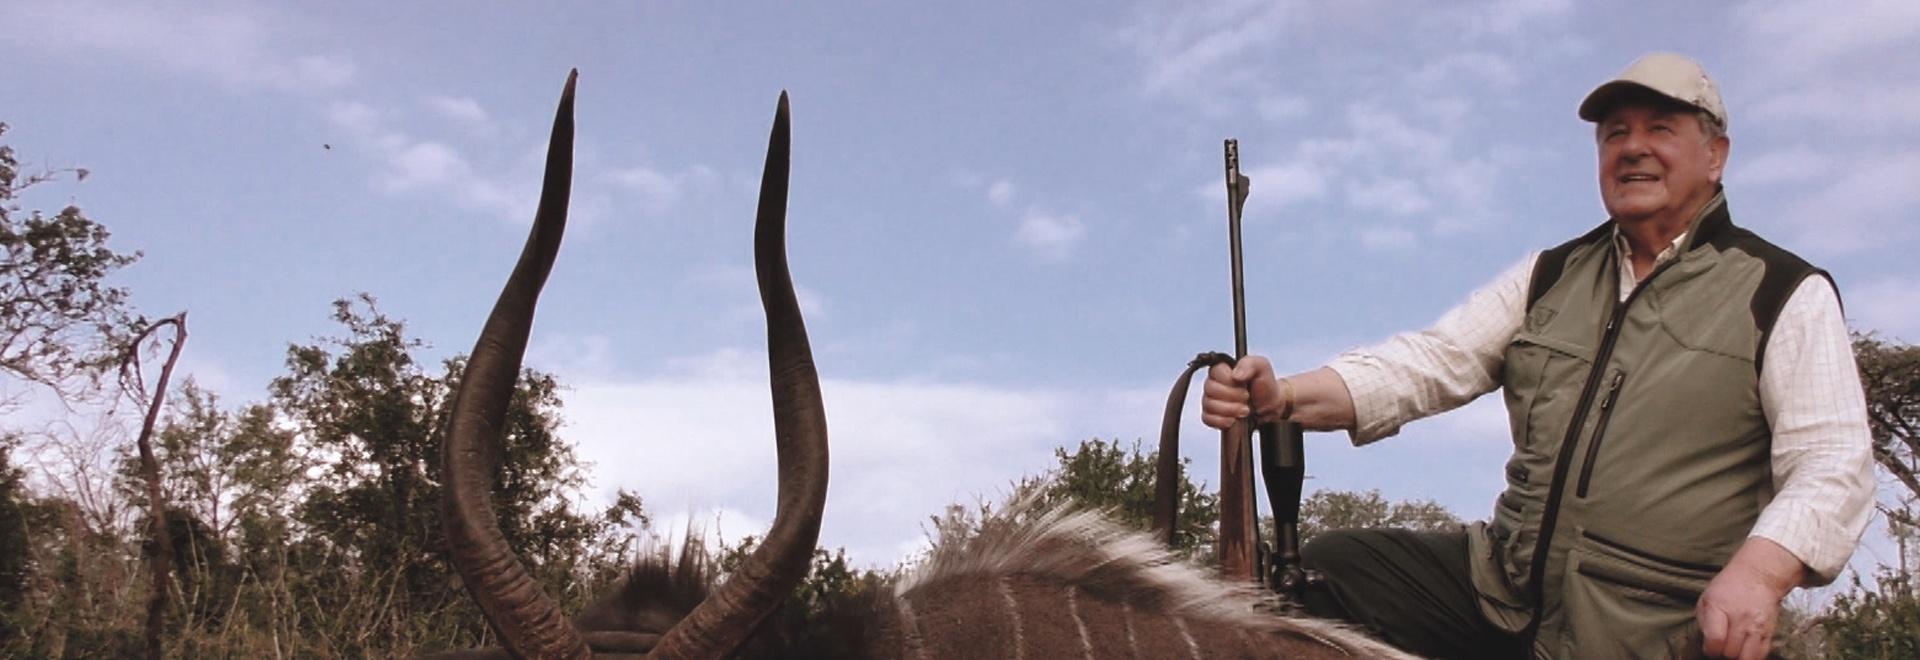 La sable e altre antilopi